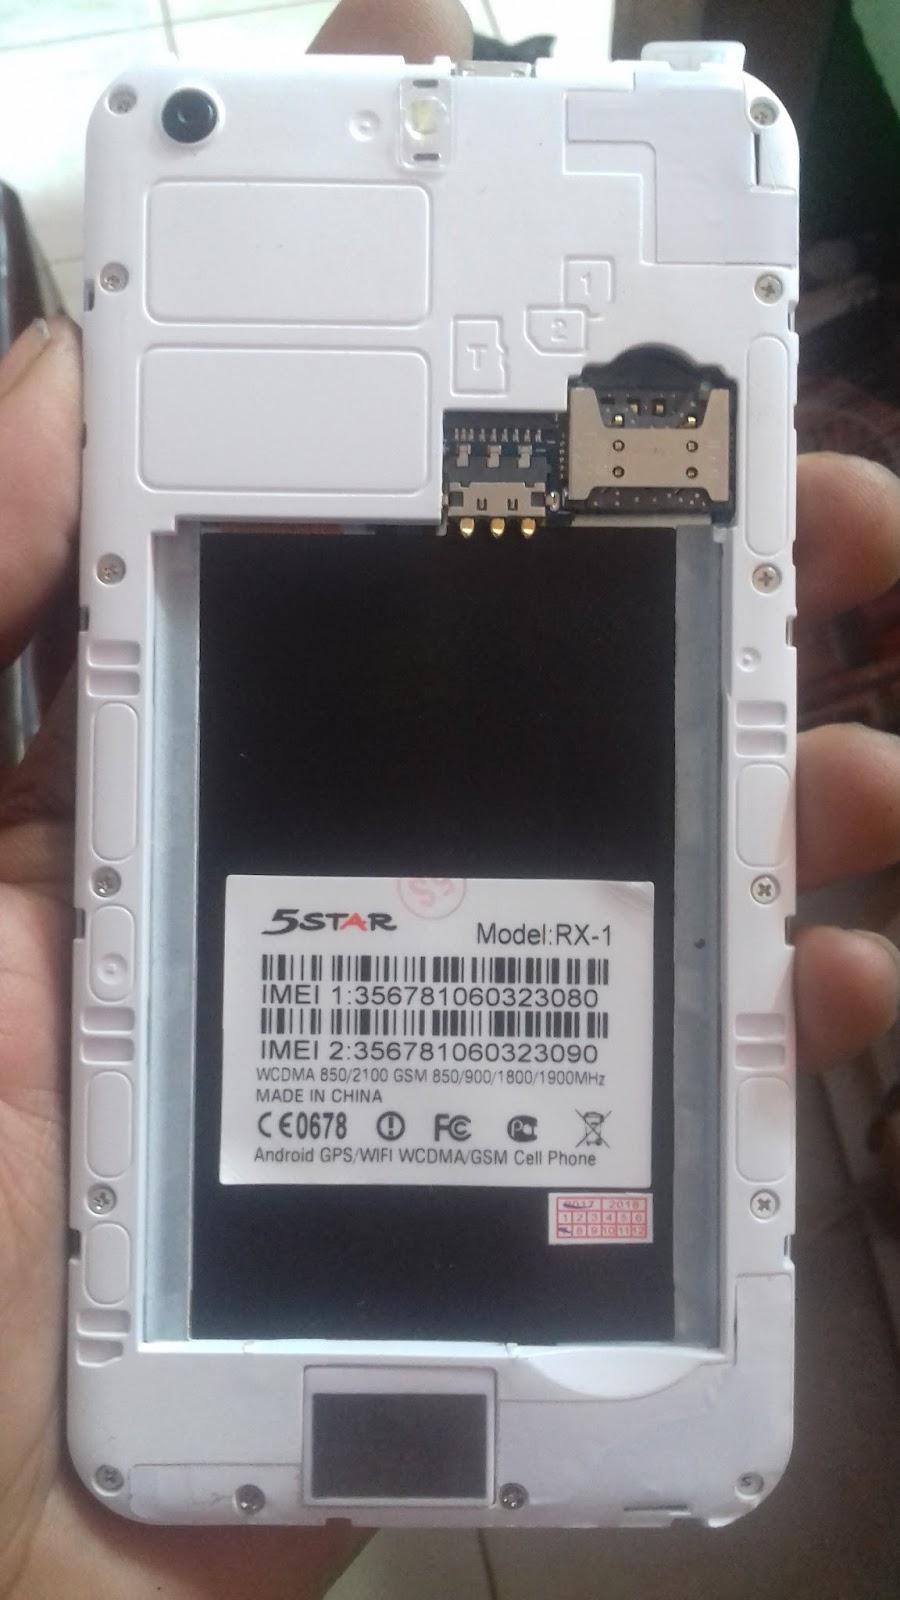 Samsung Clone A7 Star Flash File Firmware MT6580 Emmc 80